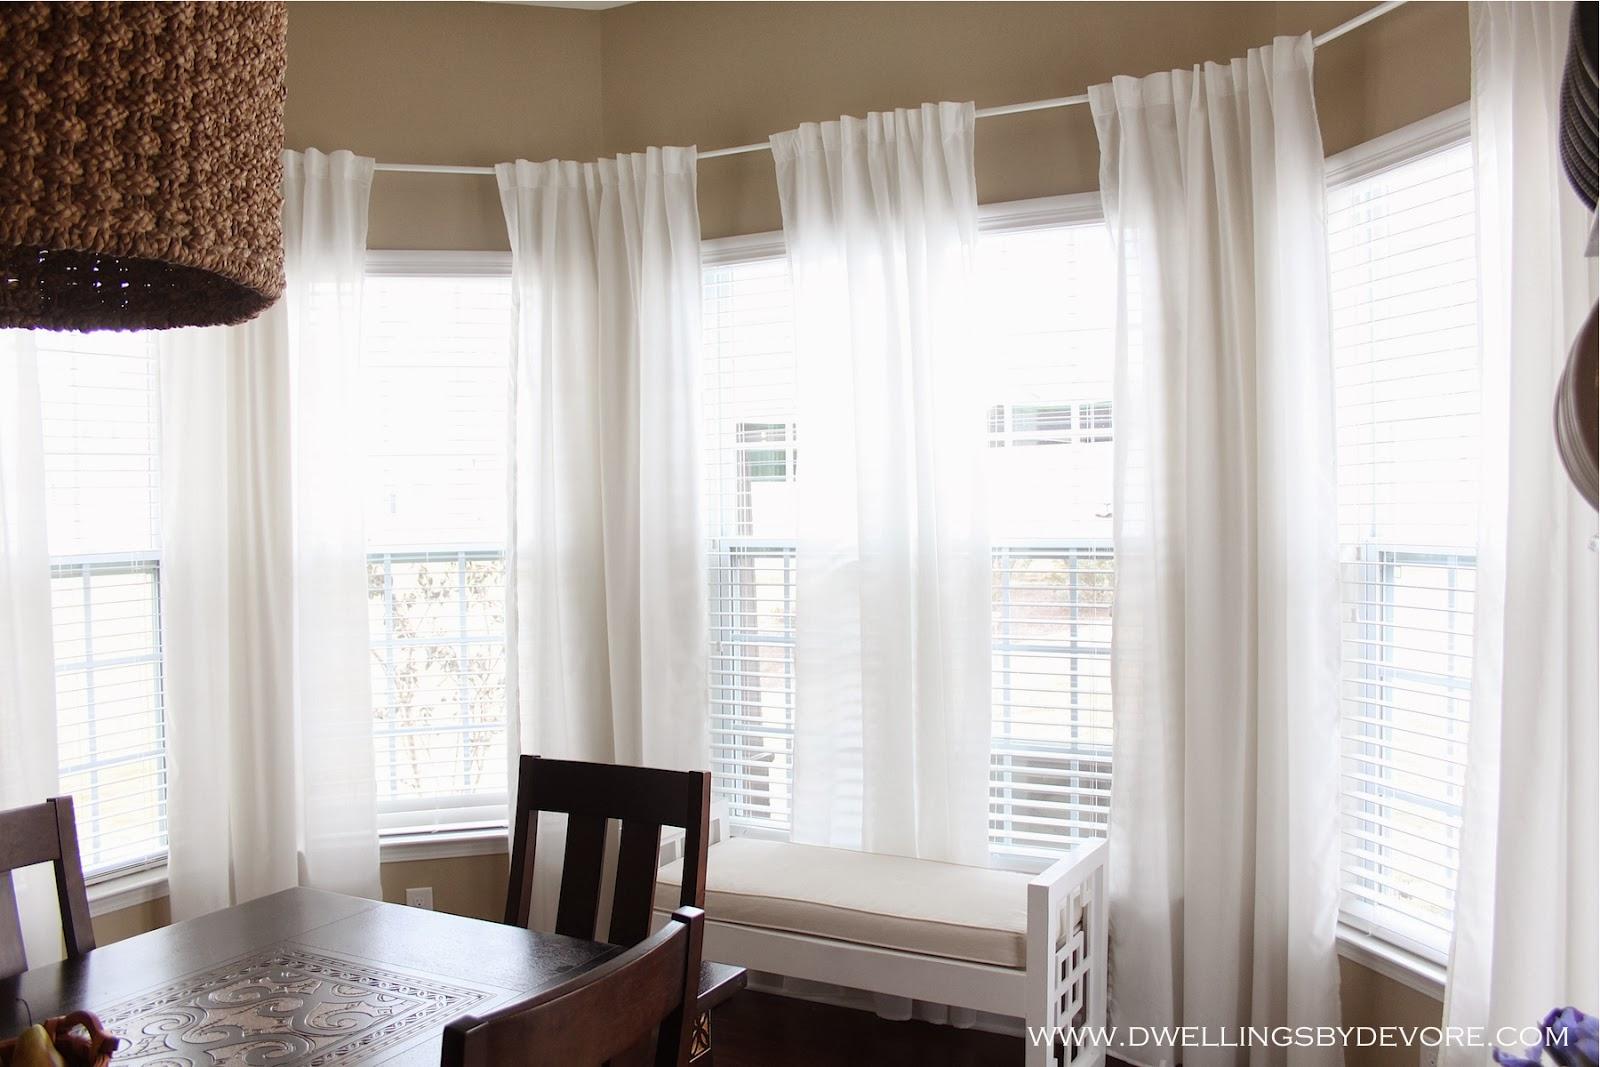 dwellings by devore bay window curtains. Black Bedroom Furniture Sets. Home Design Ideas